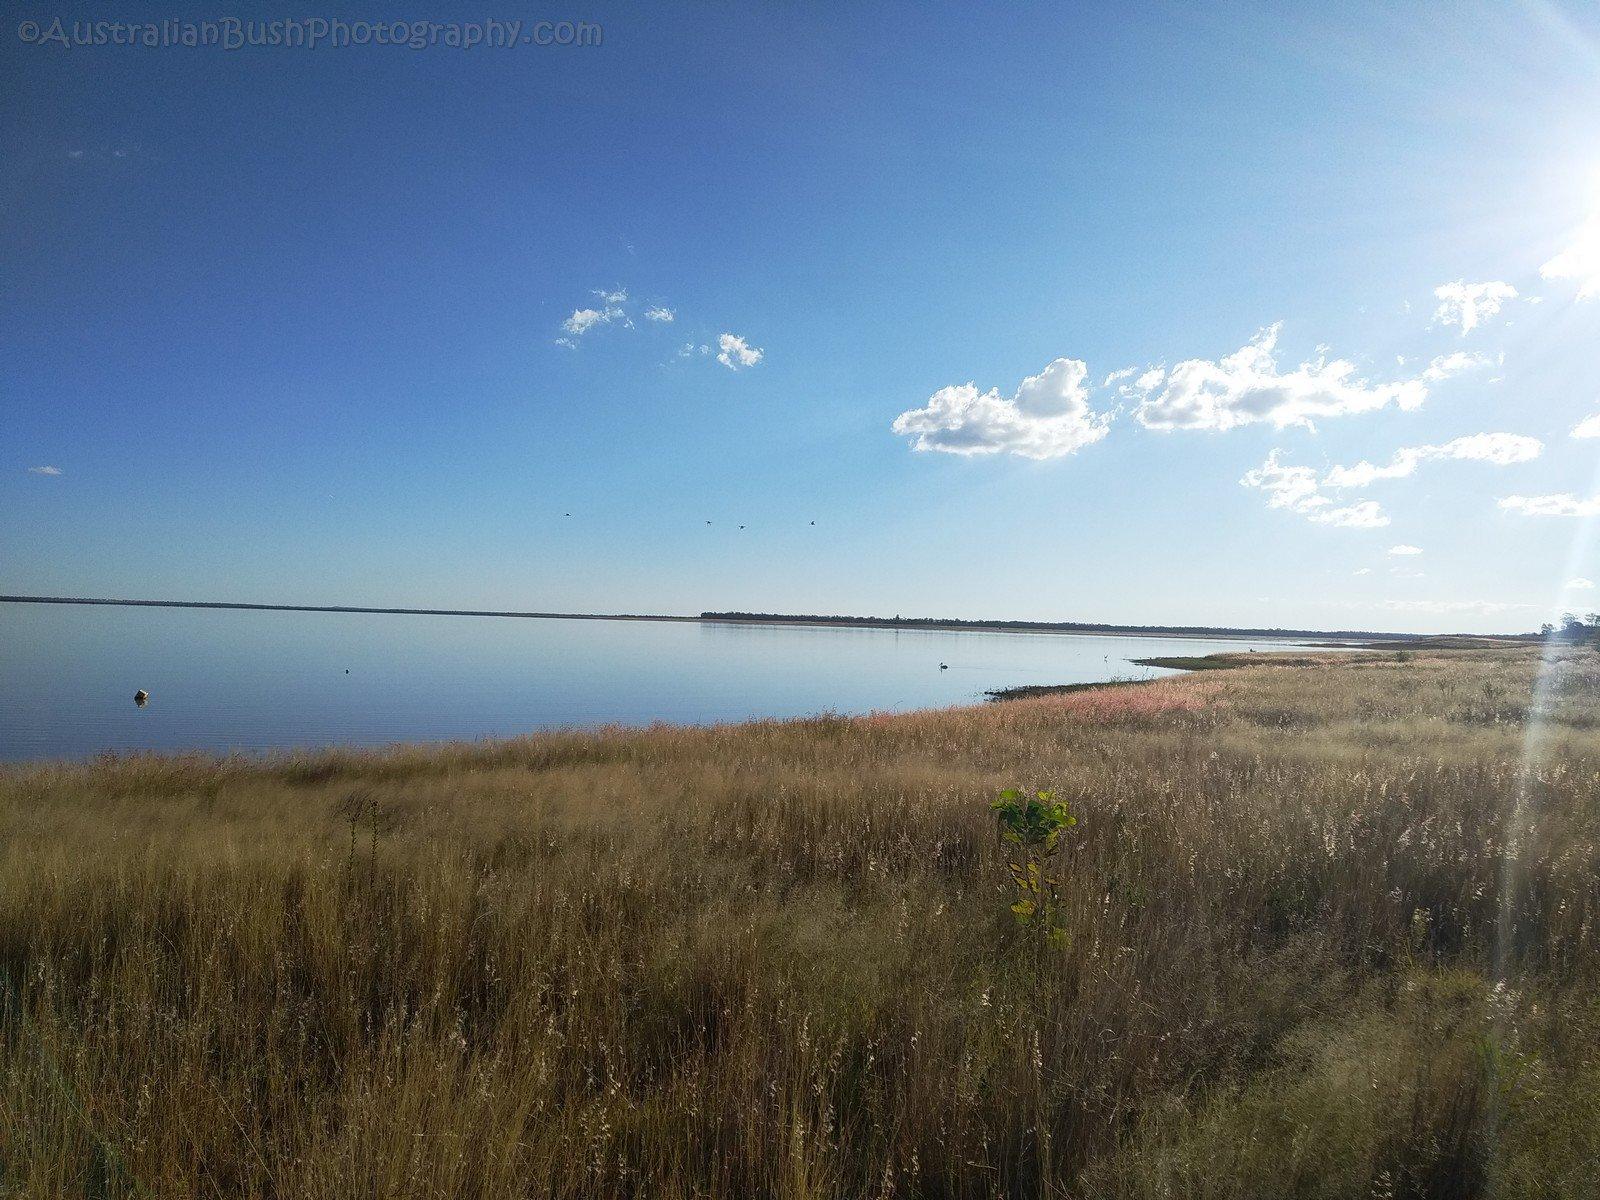 Lake Maraboon